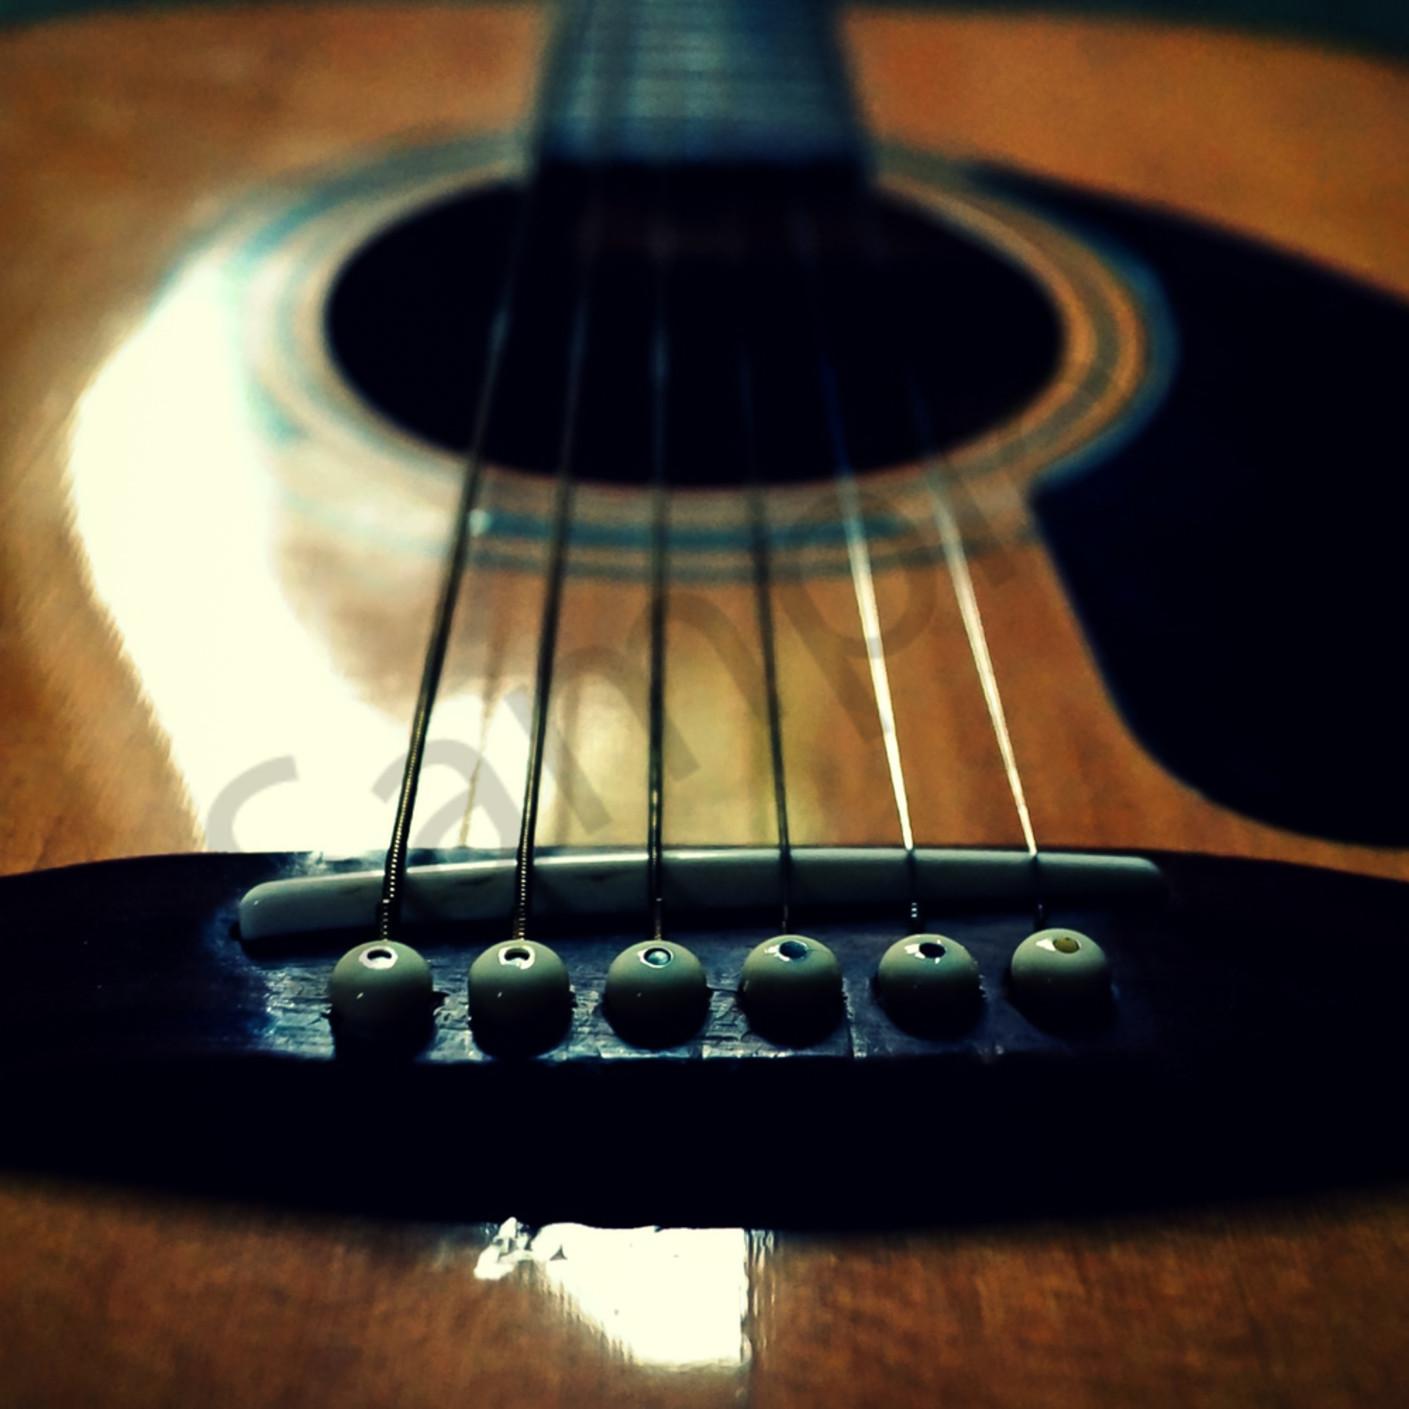 Guitar bridge ygrfeu